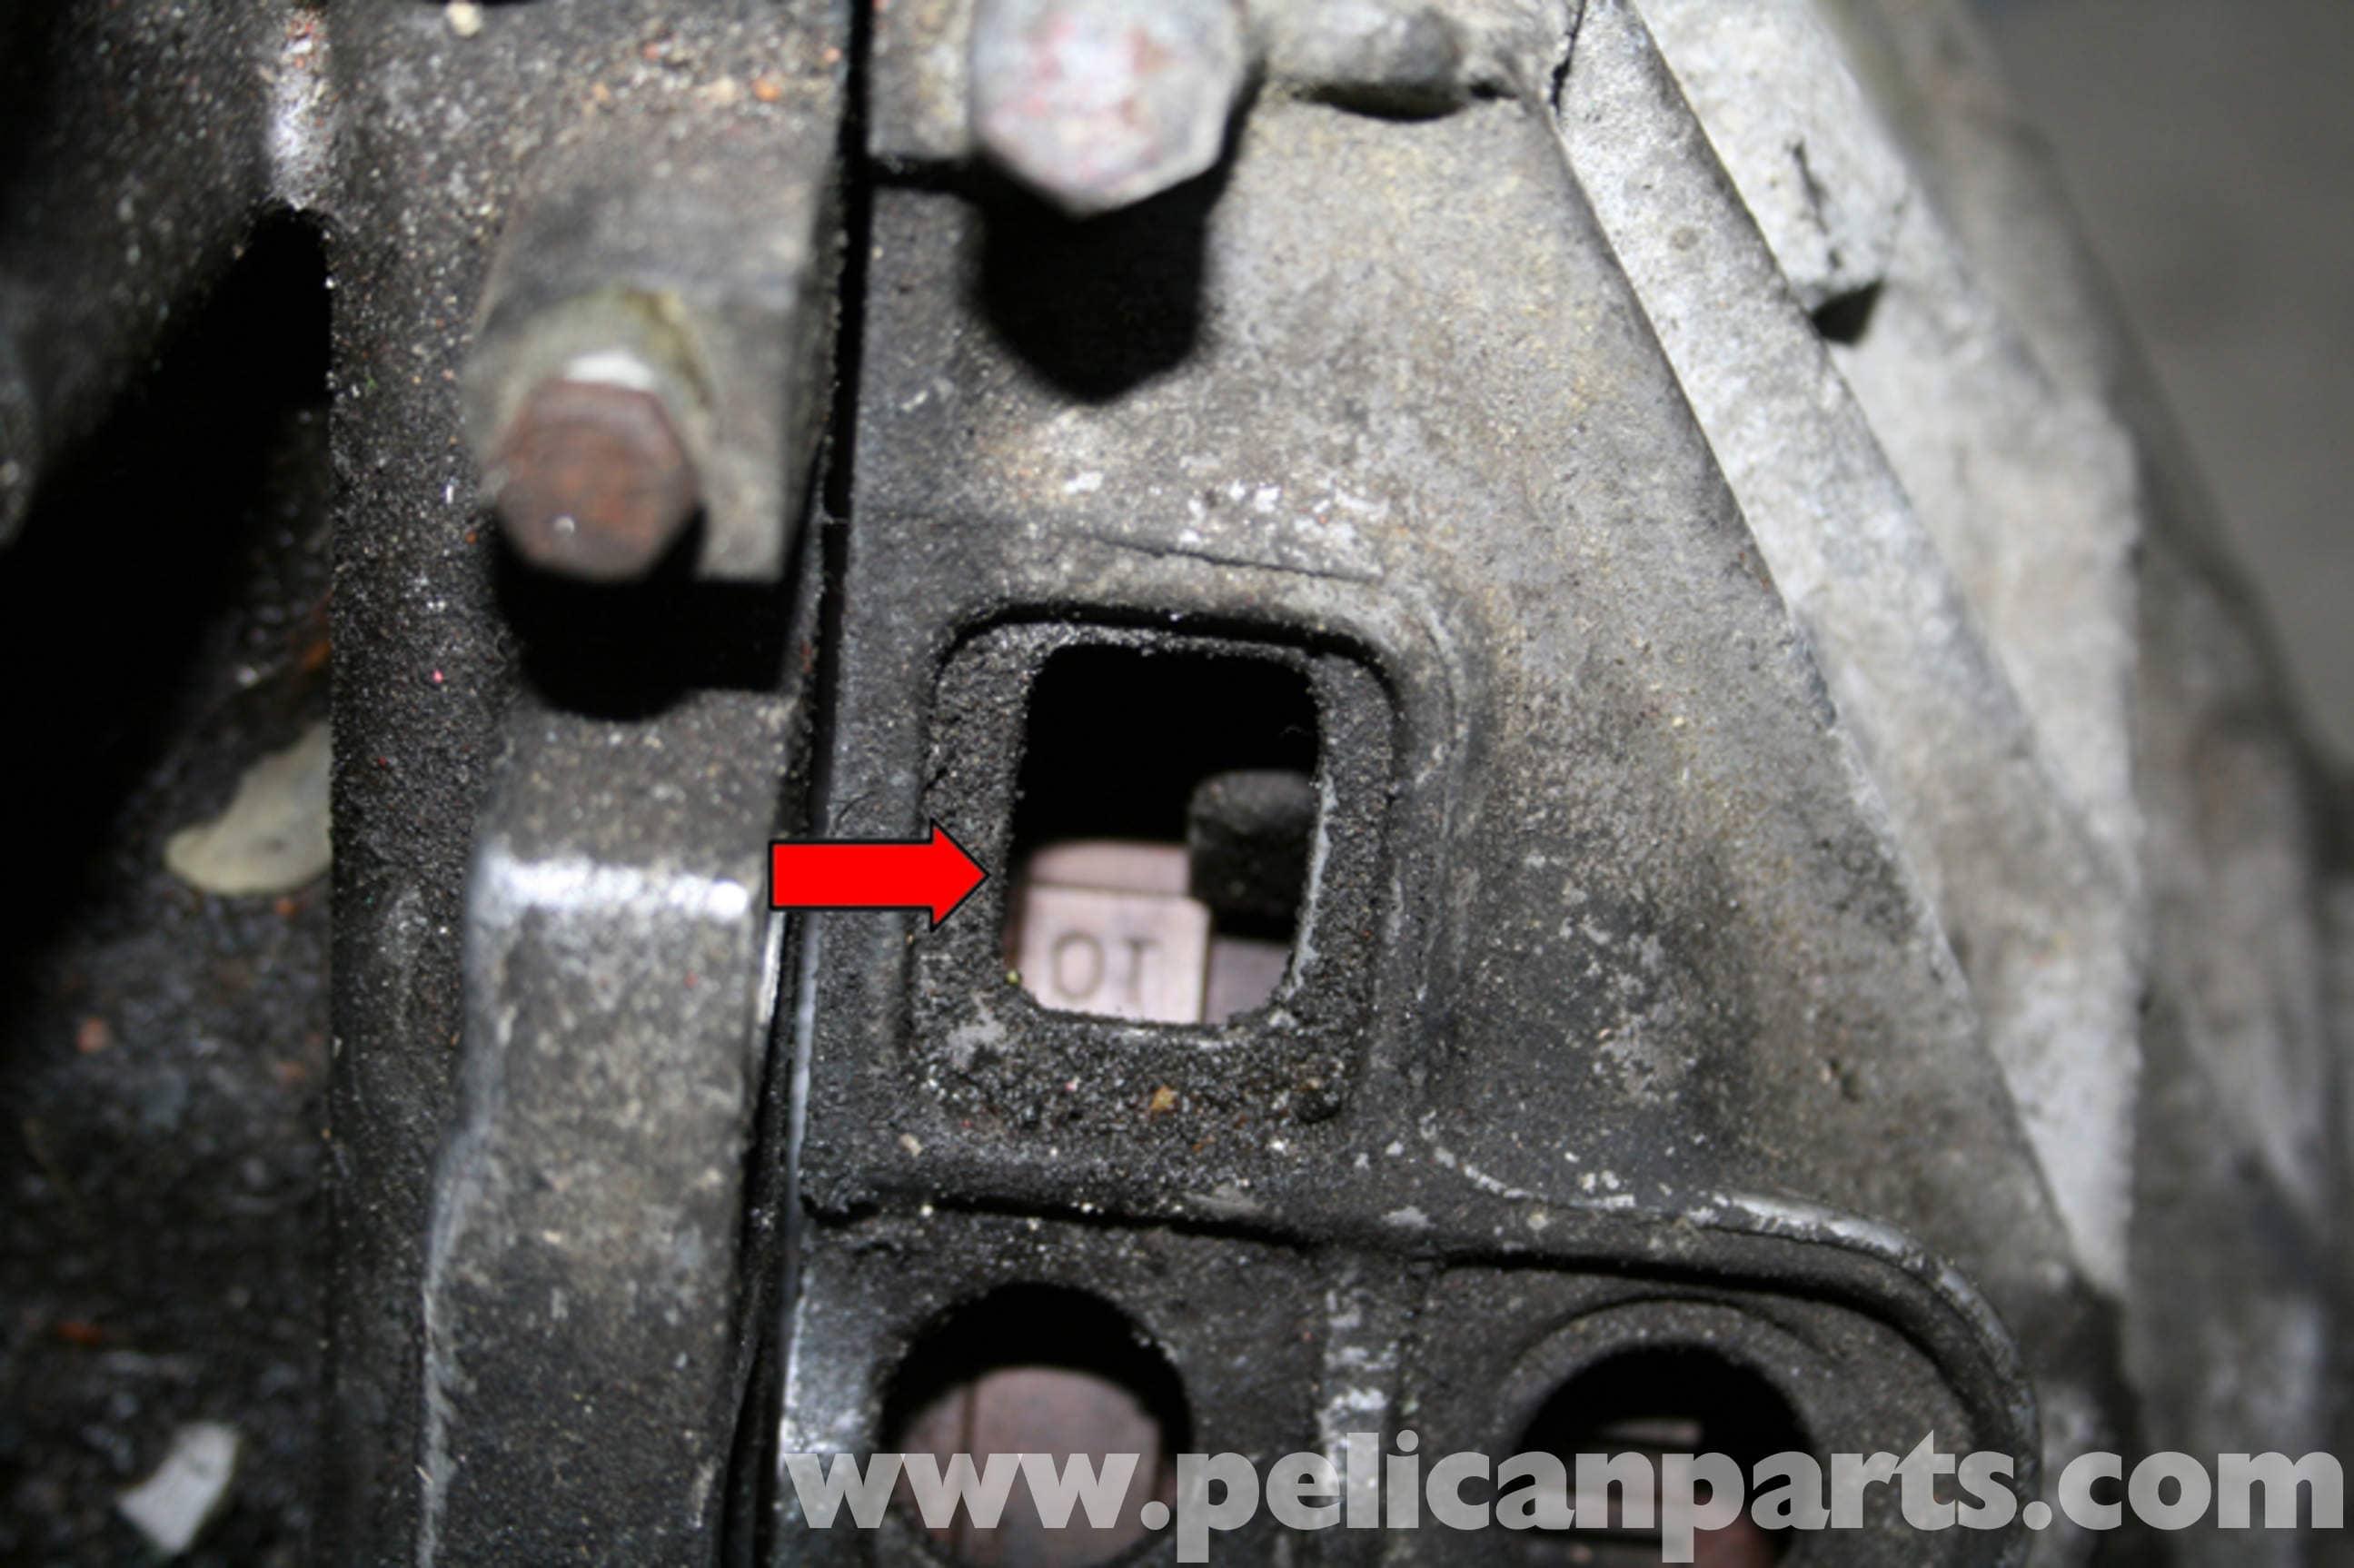 Porsche 944 Turbo Balance Shaft Belt Replacement (1986-1991) | Pelican Parts DIY Maintenance Article